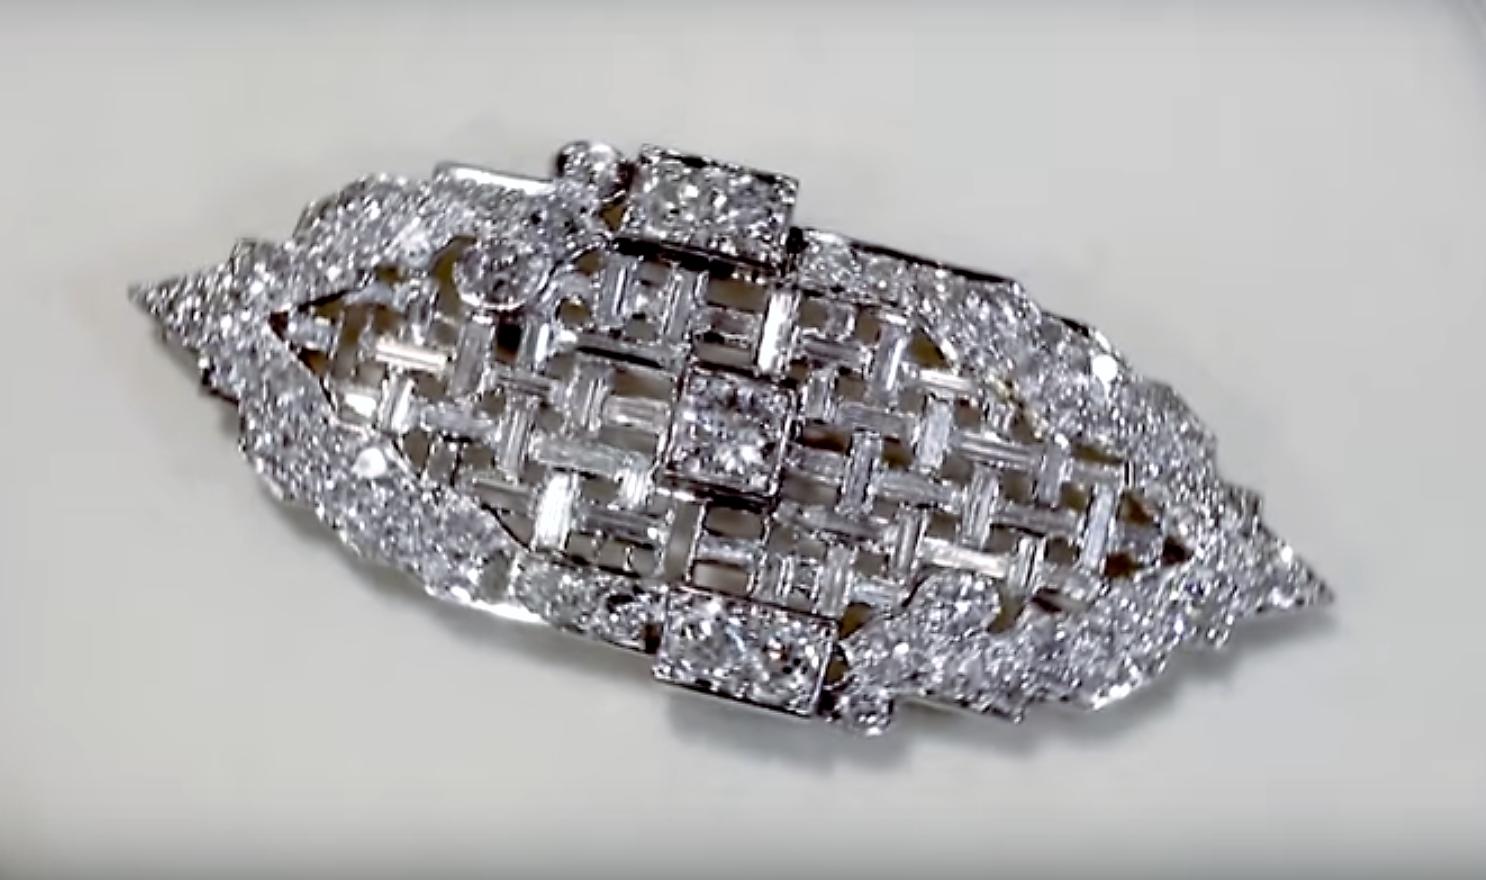 5.83 ct Diamond and Platinum Brooch - Art Deco - Antique Circa 1920 - AC Silver A4312